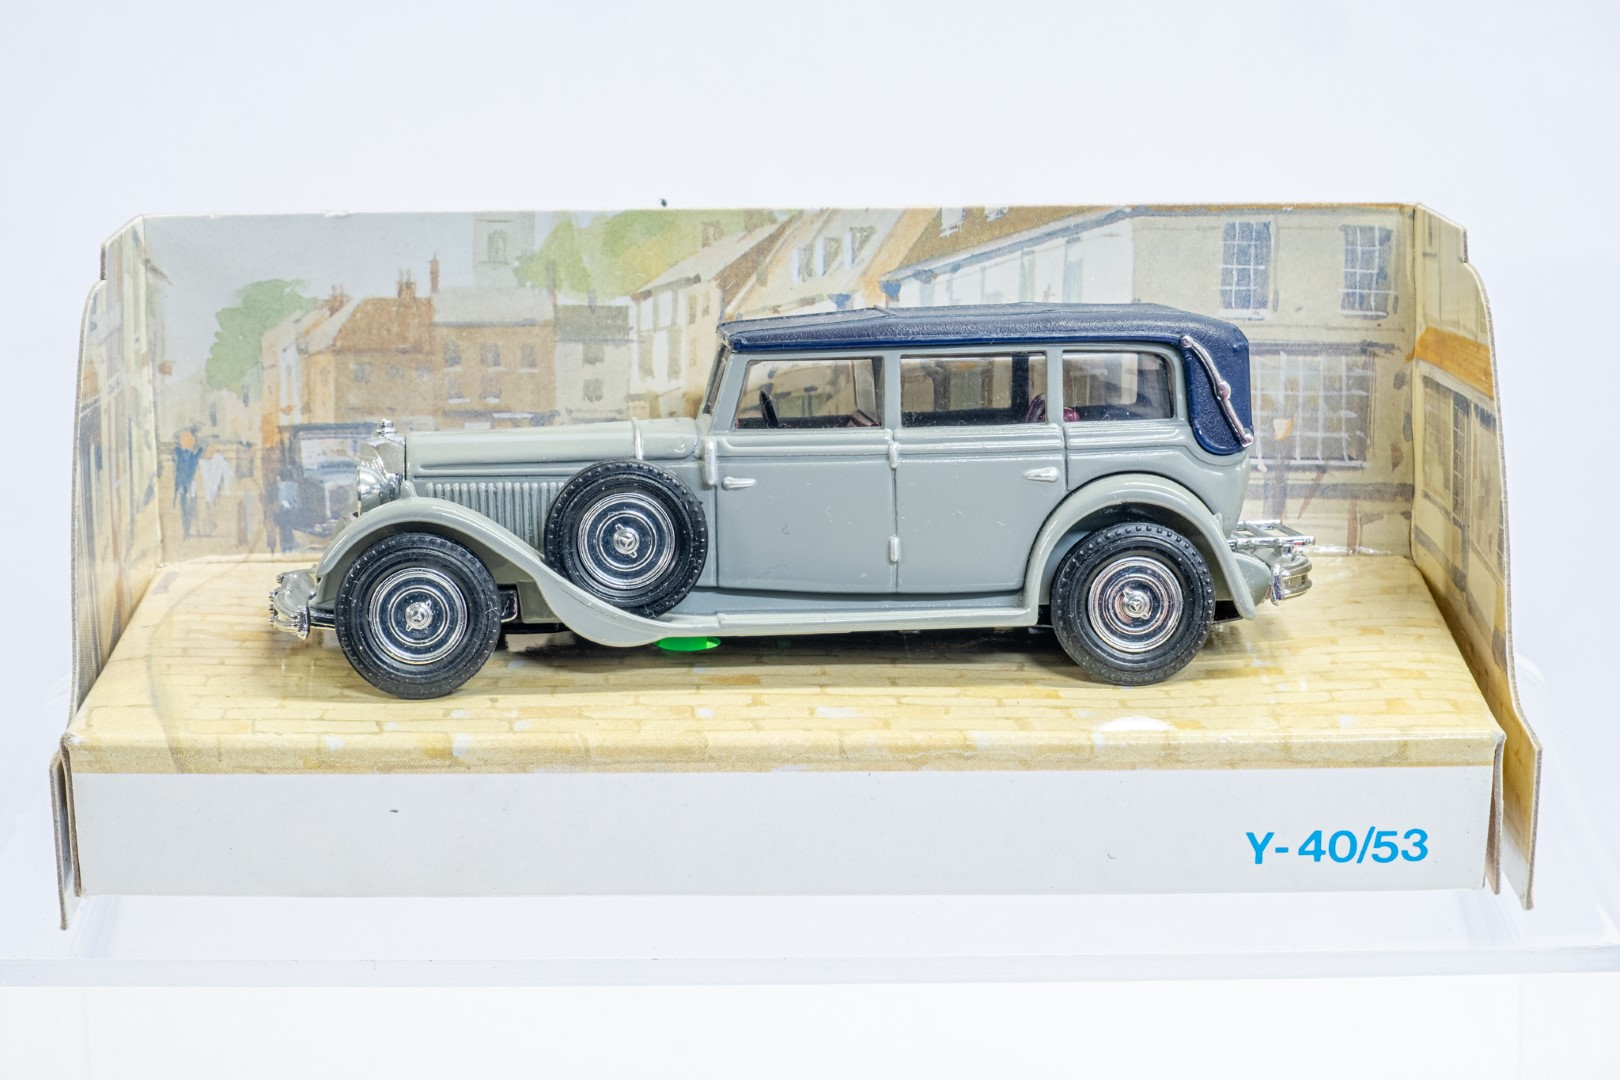 Matchbox Mercedes Benz 770 Y40 1931 - Image 4 of 4